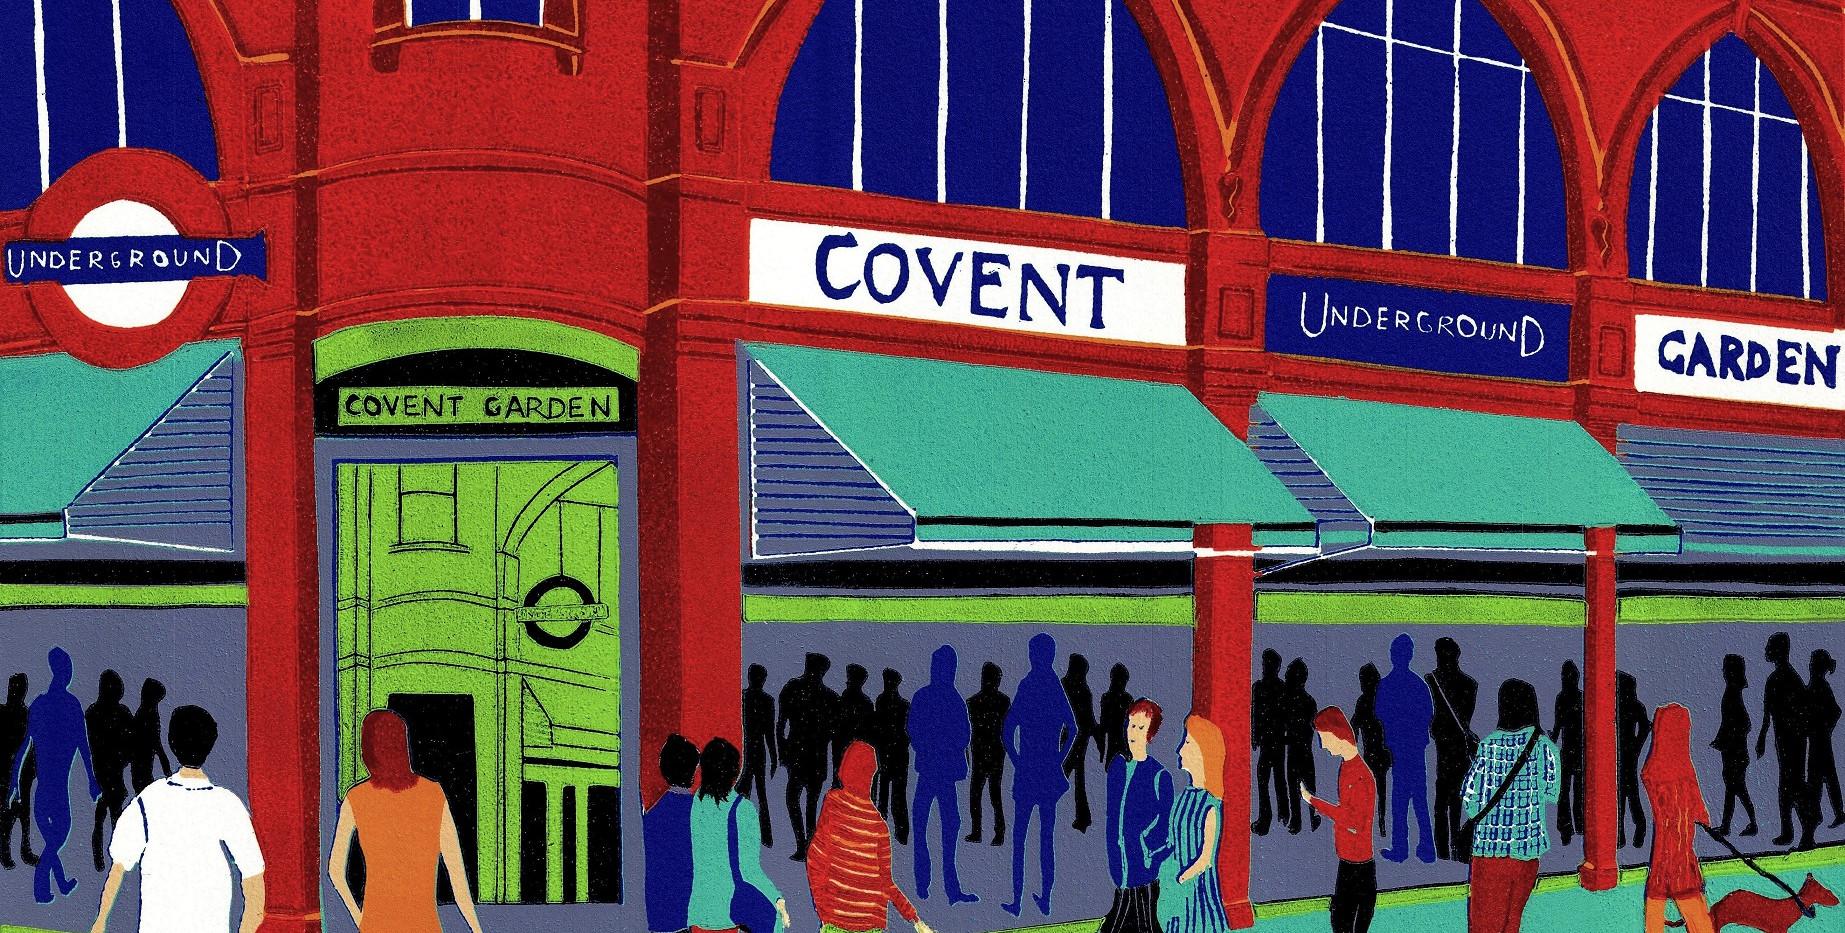 (Jennie Ing) Covent Garden Station